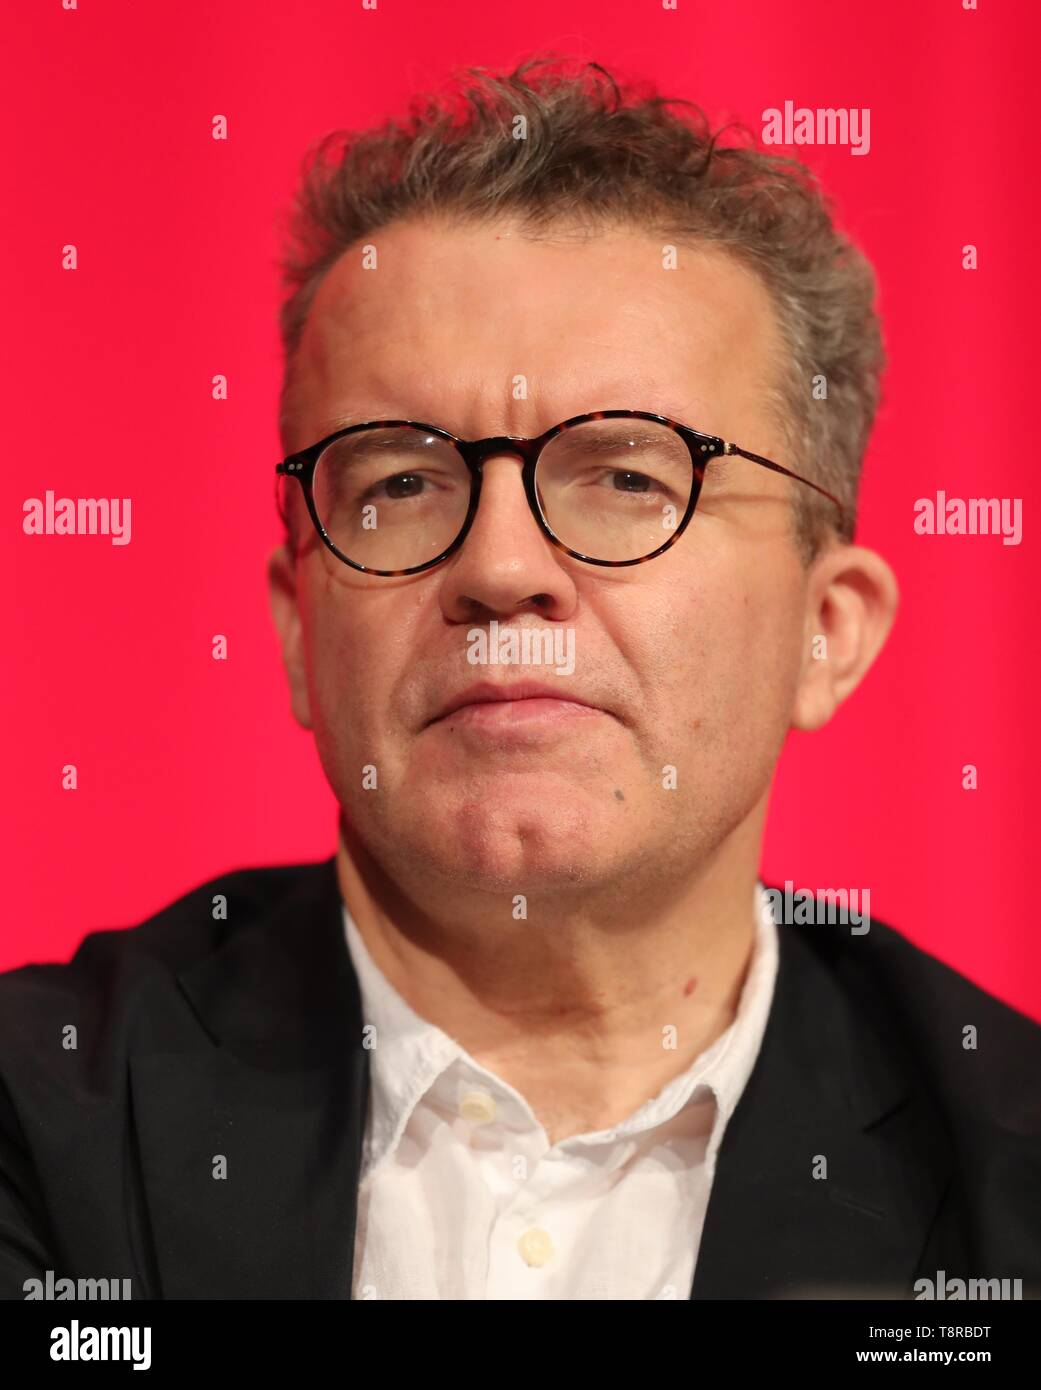 TOM WATSON MP, 2018 - Stock Image